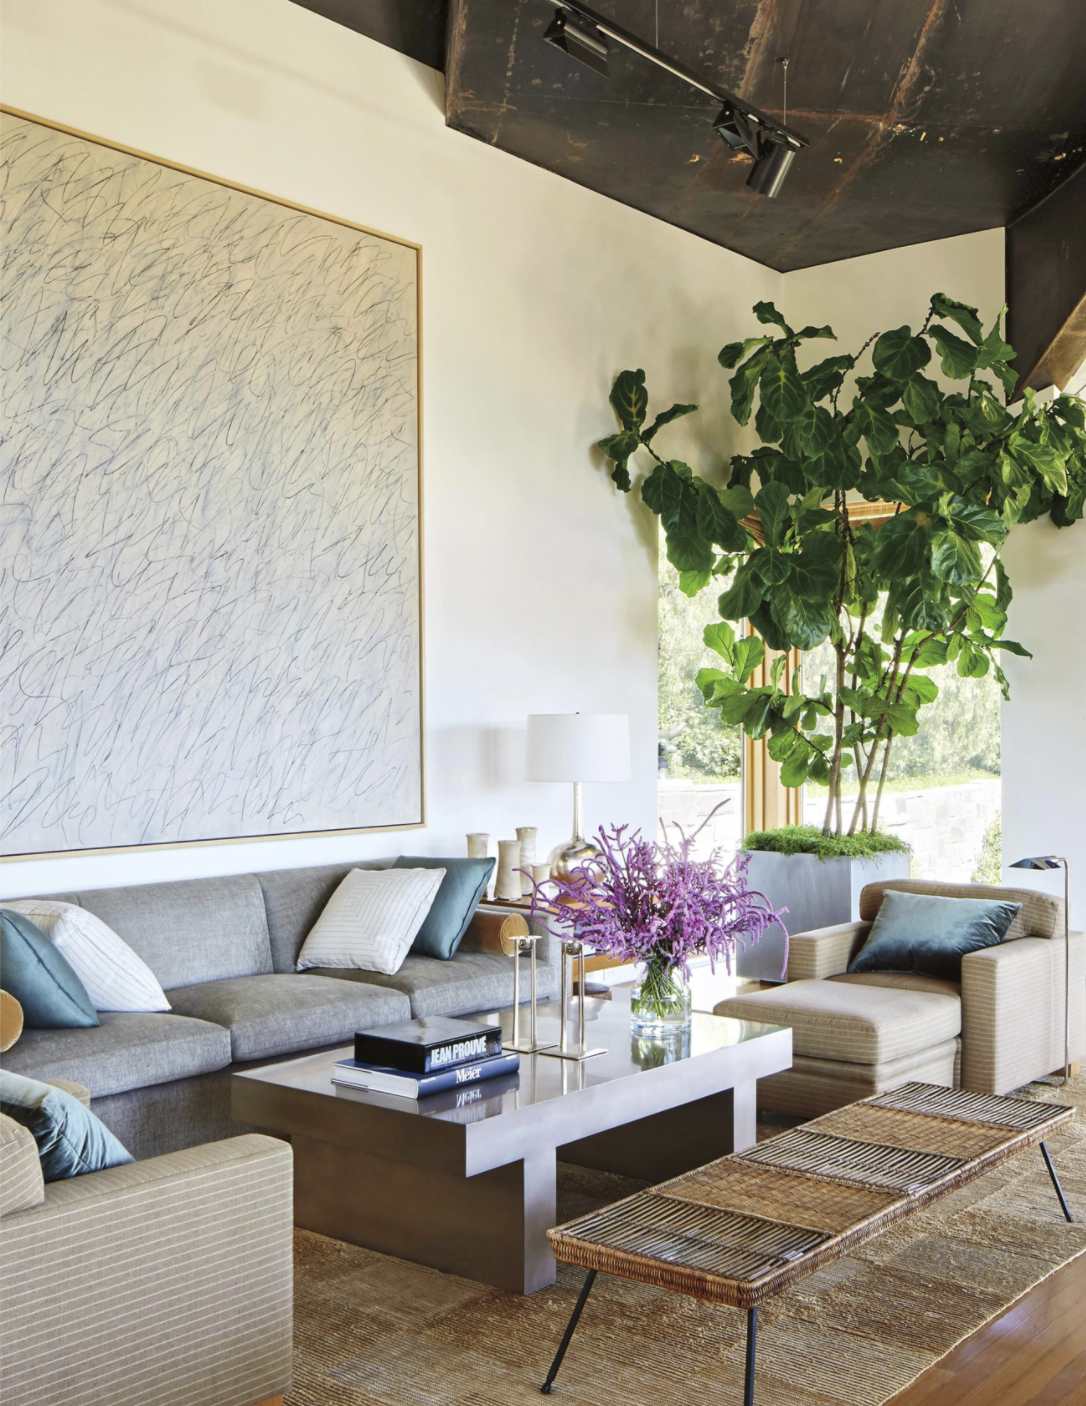 AD 2015 Broad Living Room